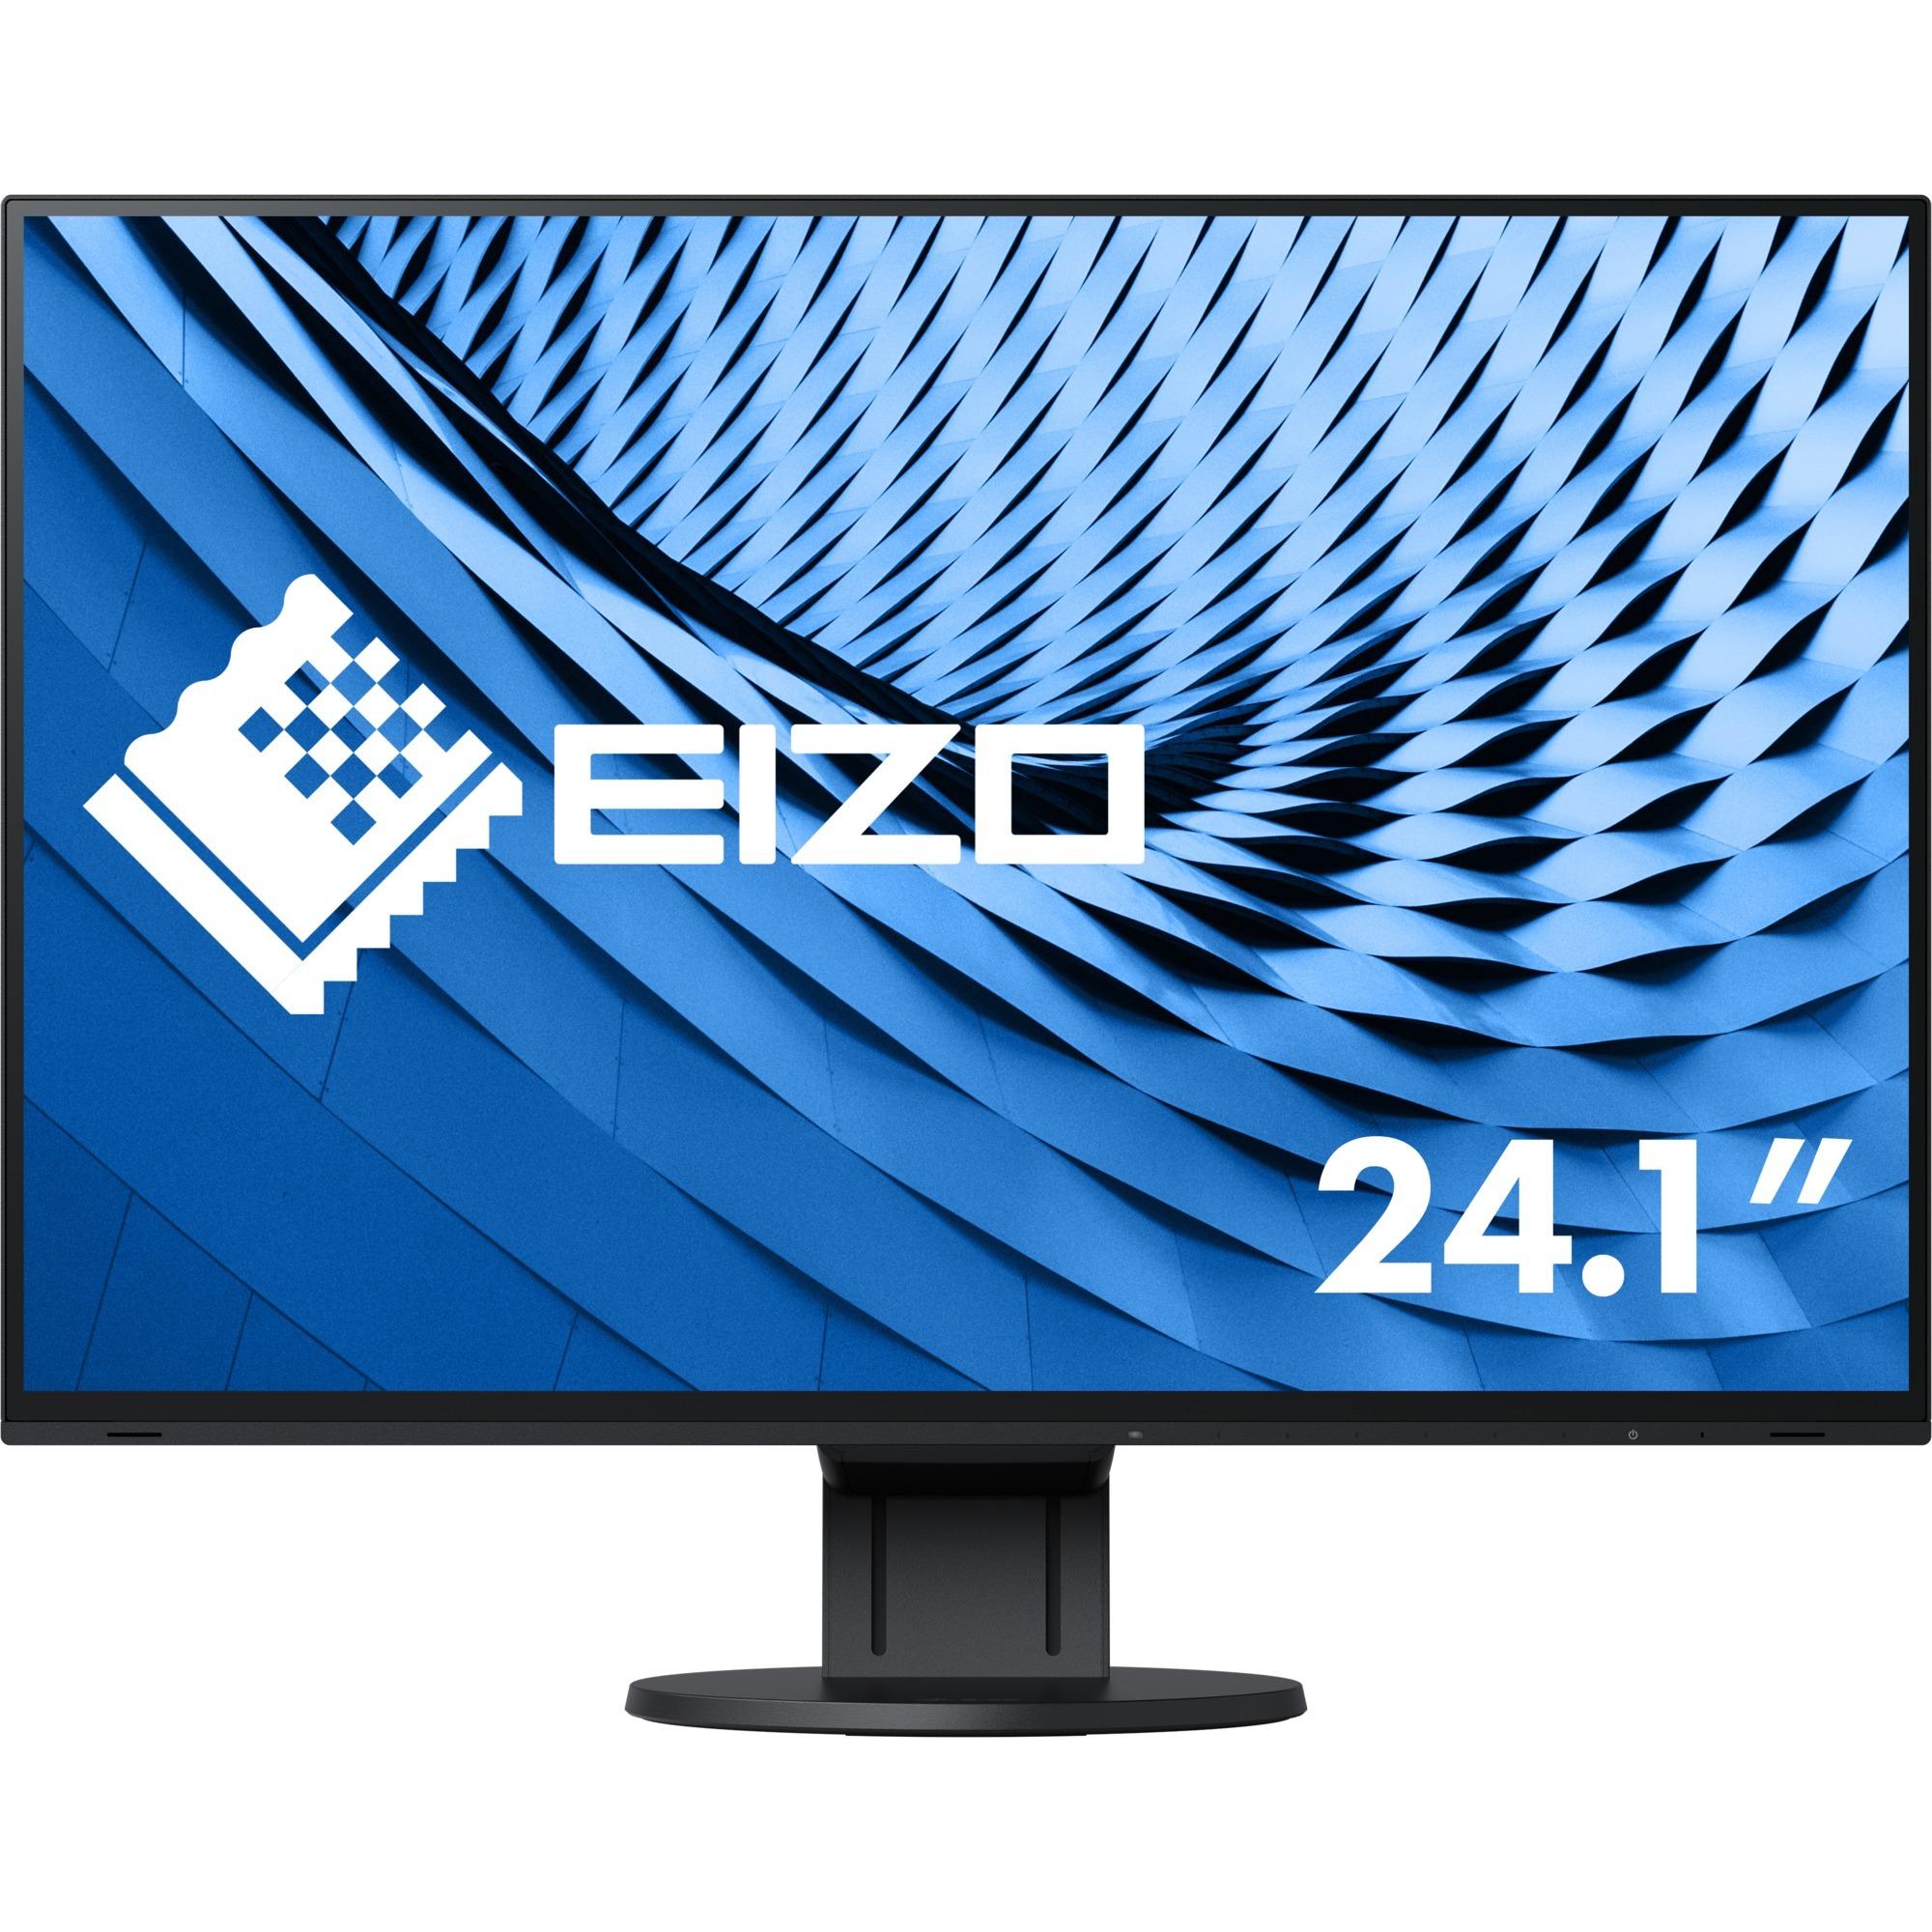 EV2457-BK, Monitor LED